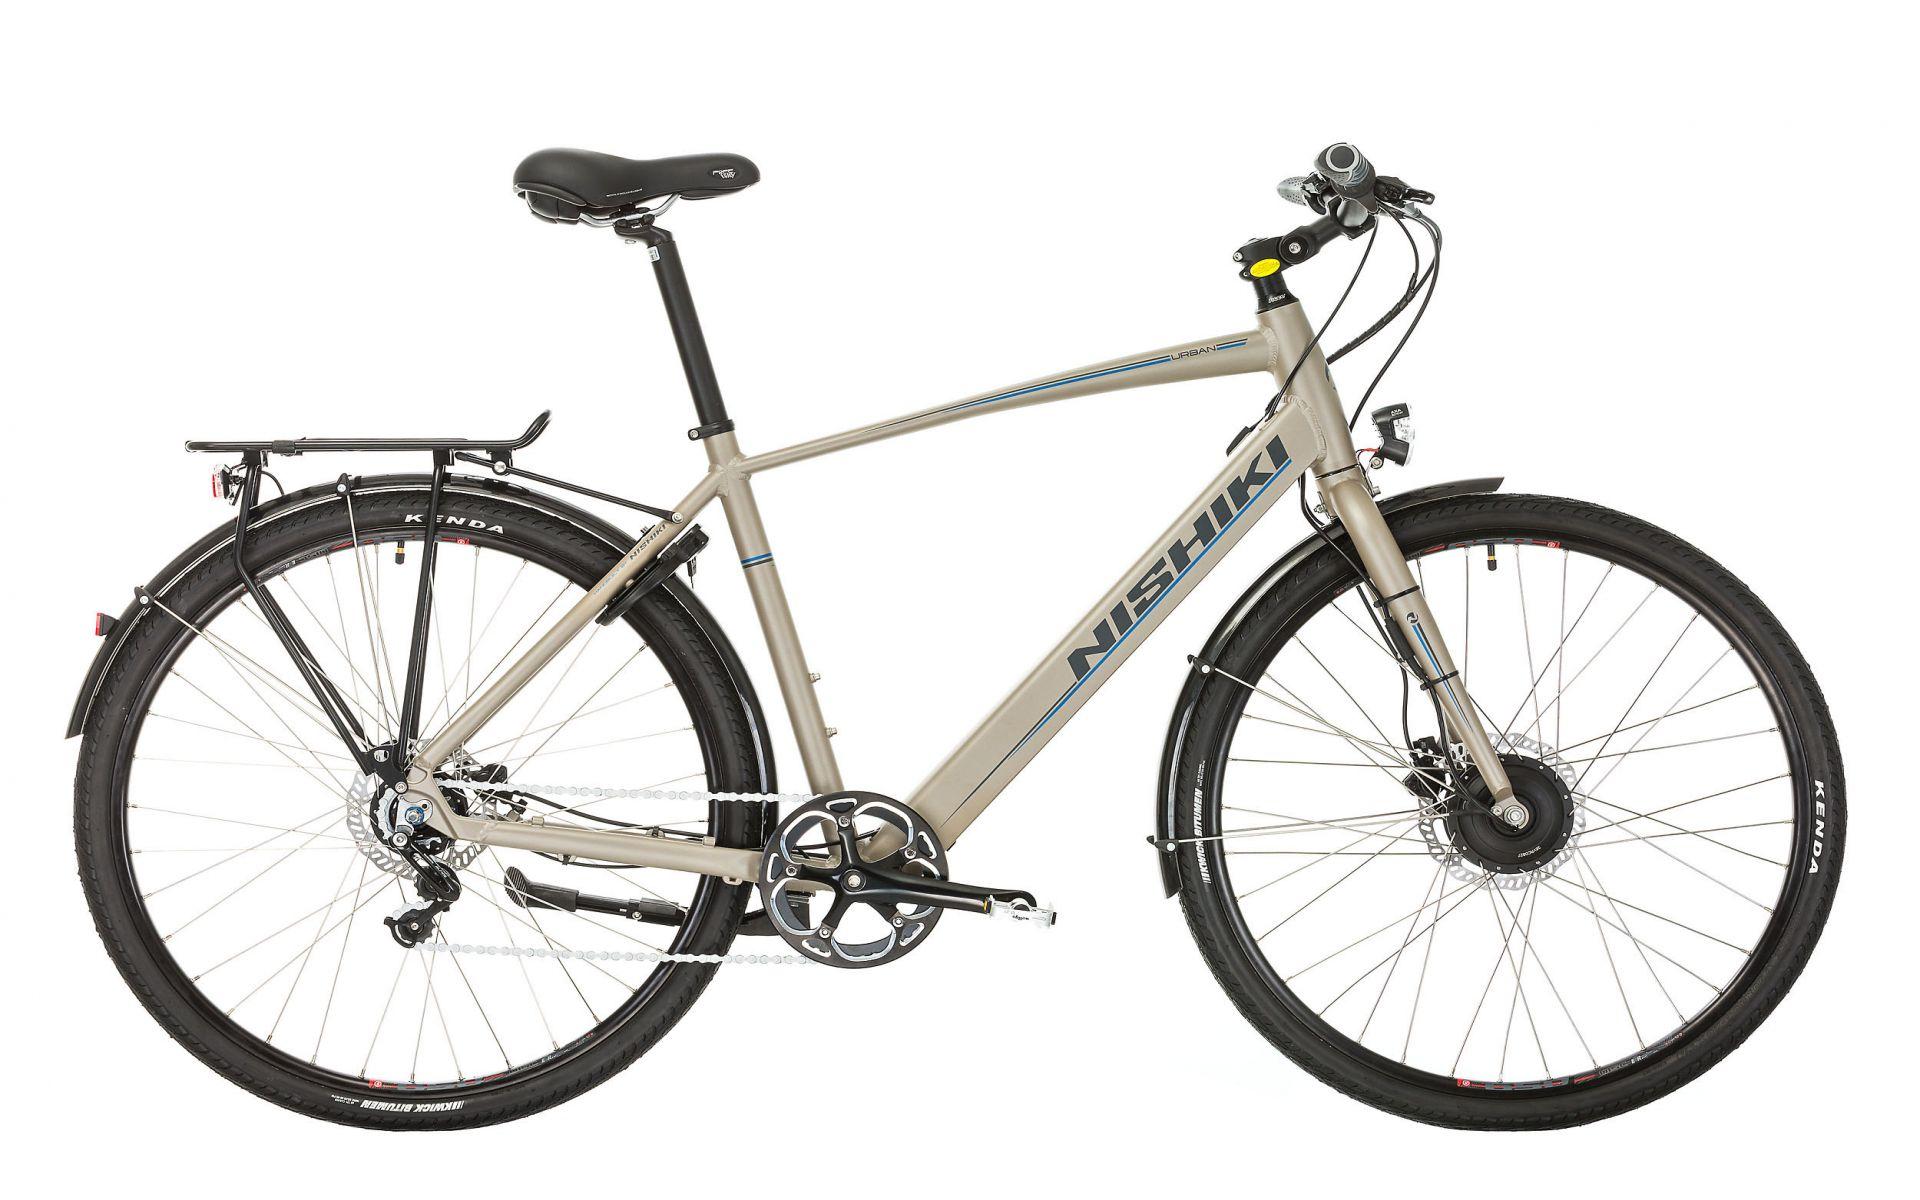 Nishiki Urban Herre Elcykel 7 Gear Mat Grå - 2018 Cykler||Nishiki Cykler||Nishiki Elcykler